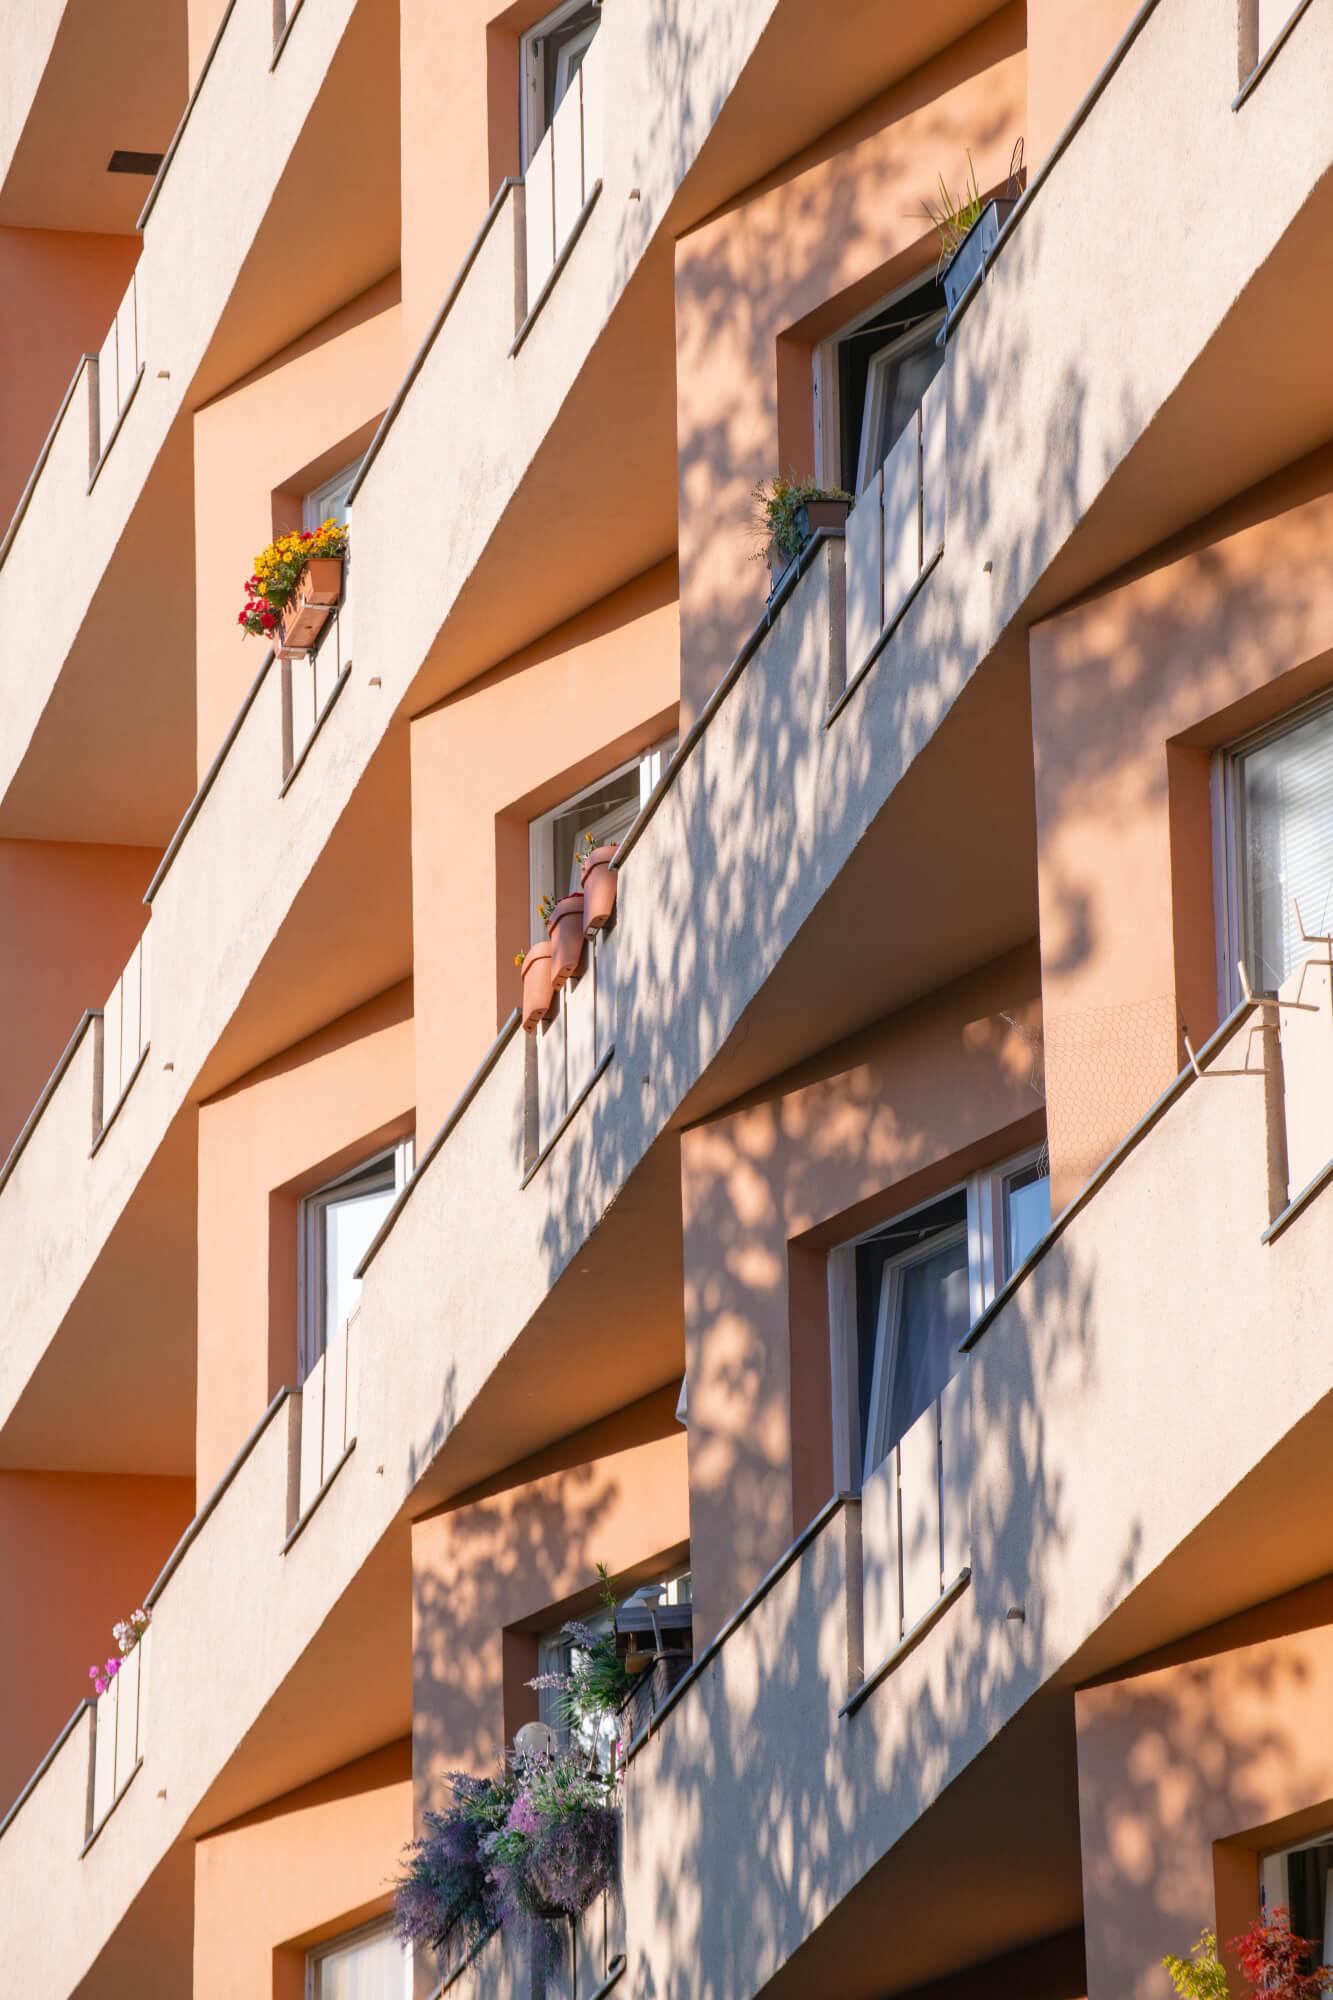 Apricot, balconies, Berlin apartment building